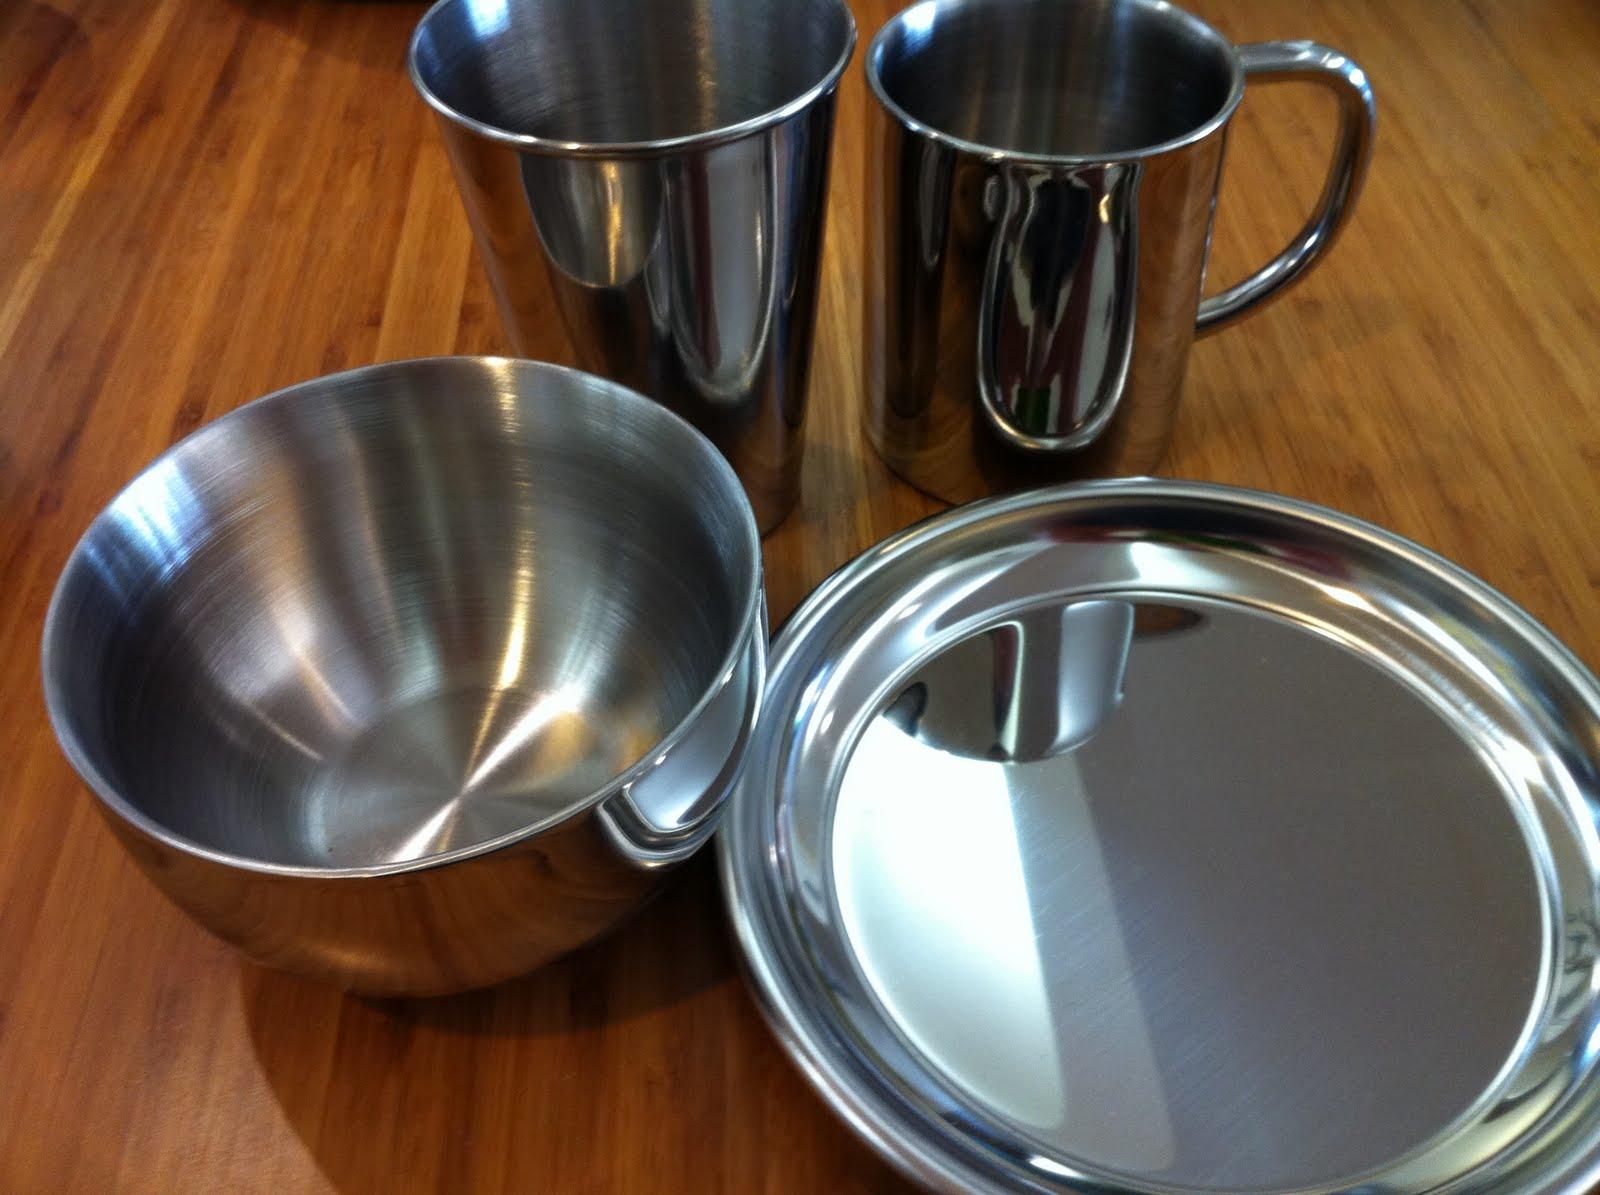 greendesign stainless steel dinnerware back in stock. Black Bedroom Furniture Sets. Home Design Ideas